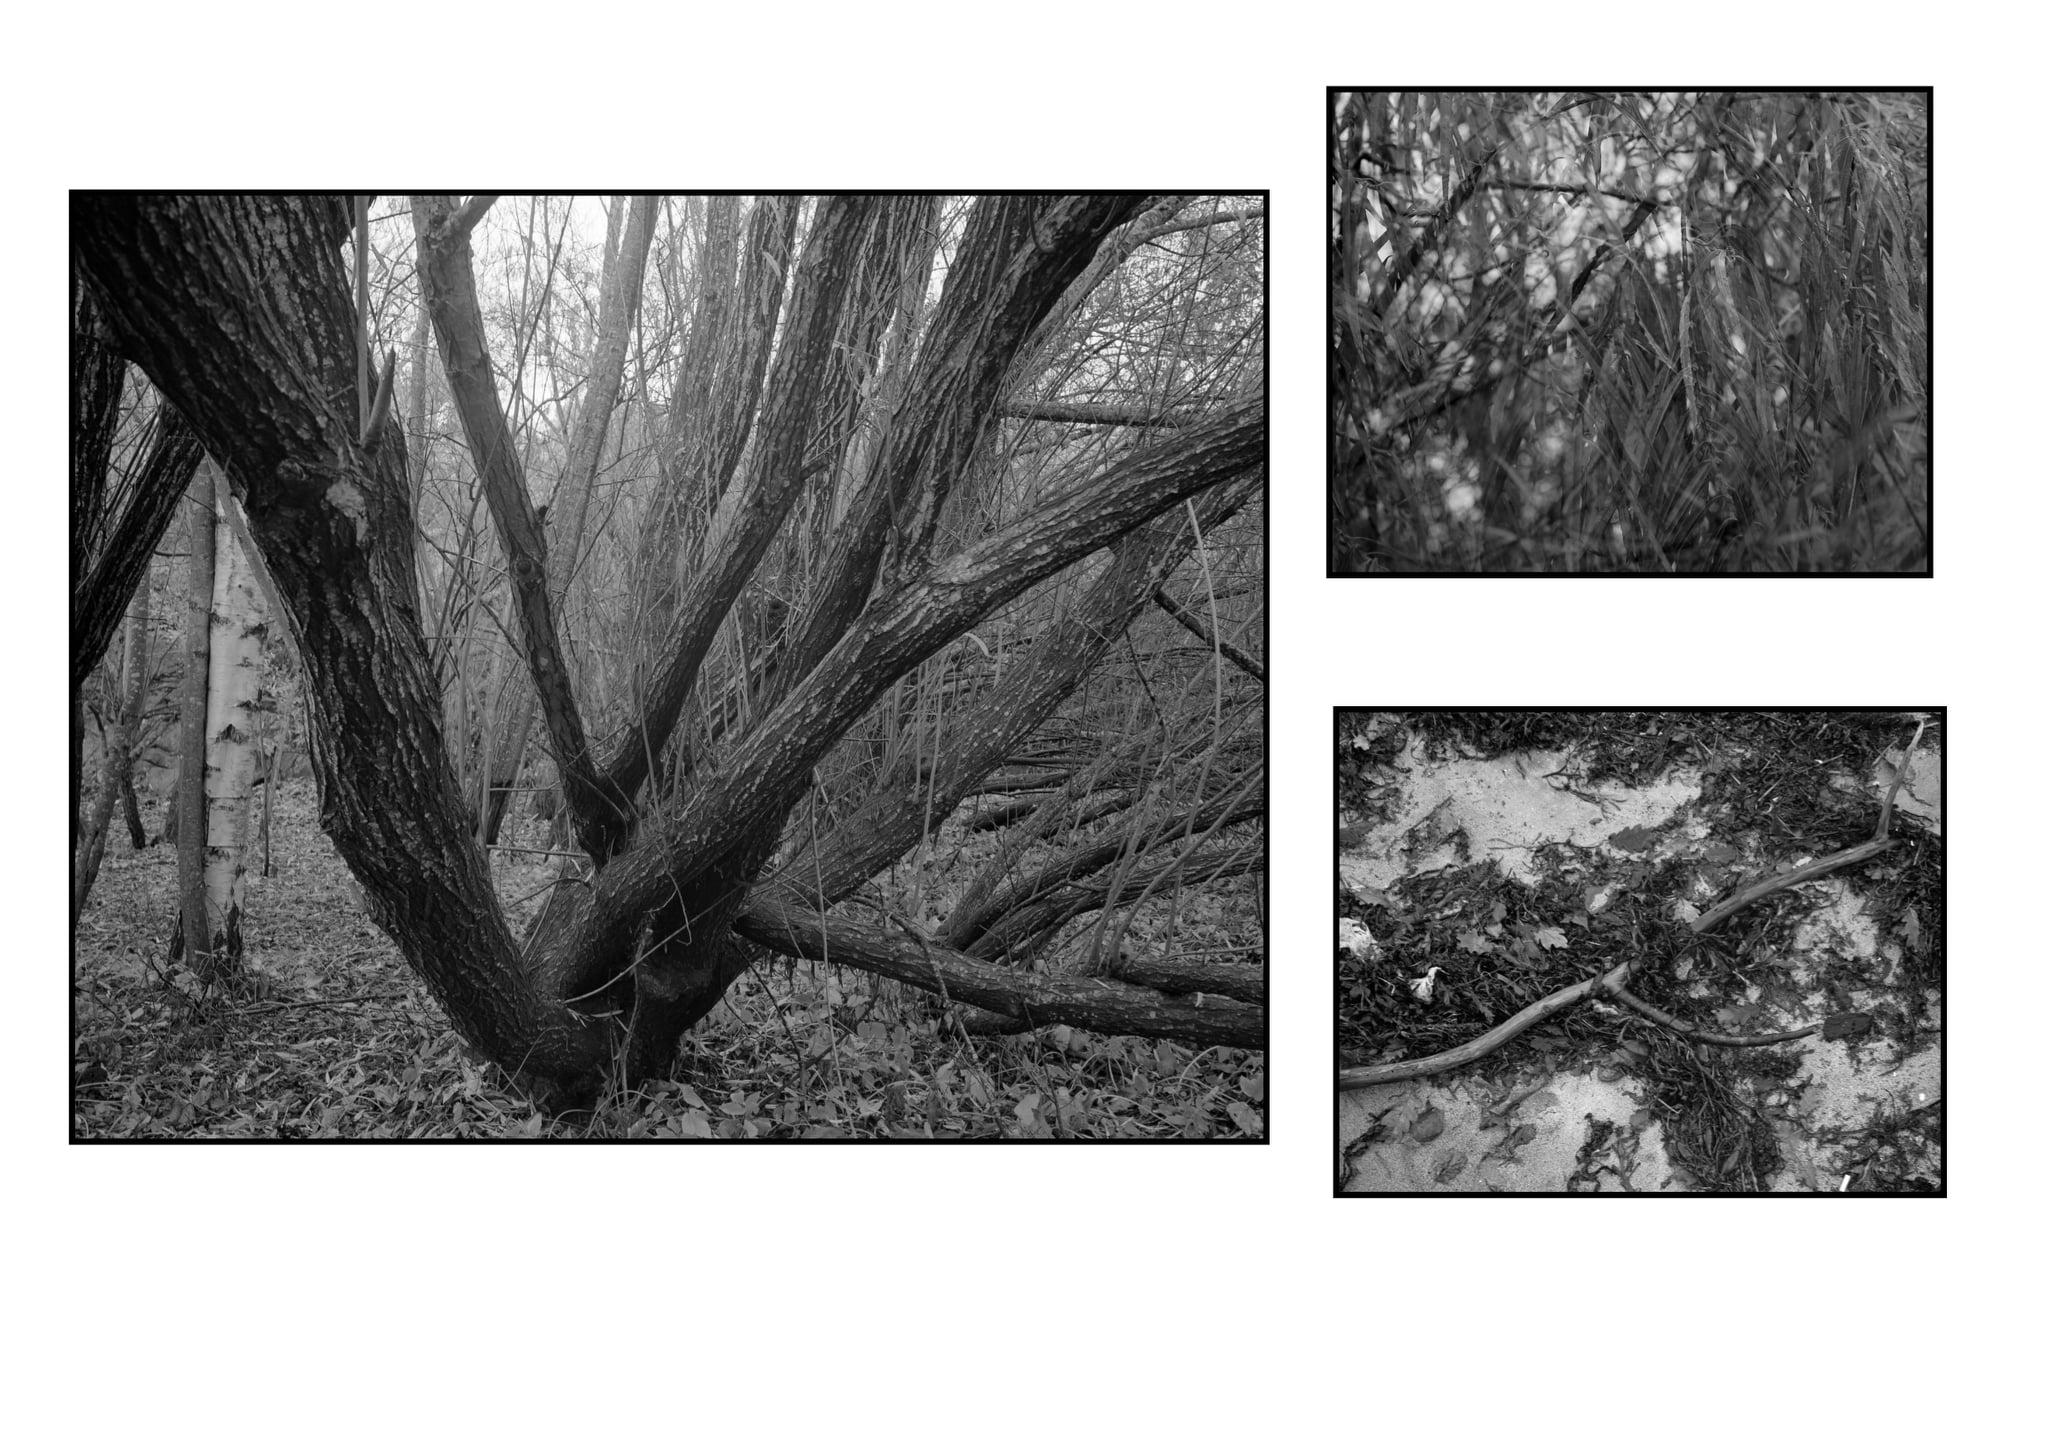 Triptych (Robin Bjerkhaug)